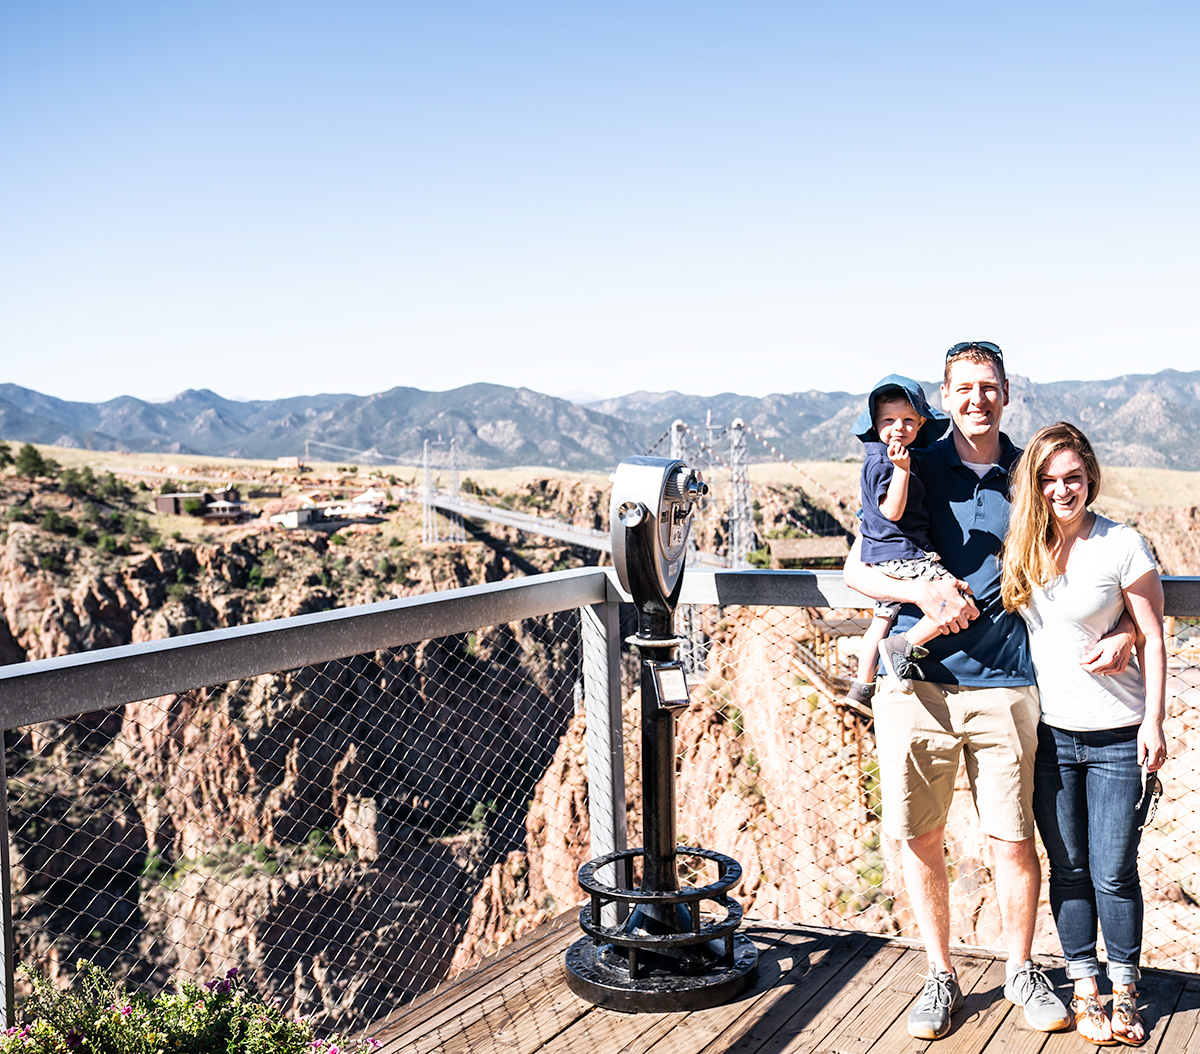 View-at-Royal-Gorge-Bridge-Colorado